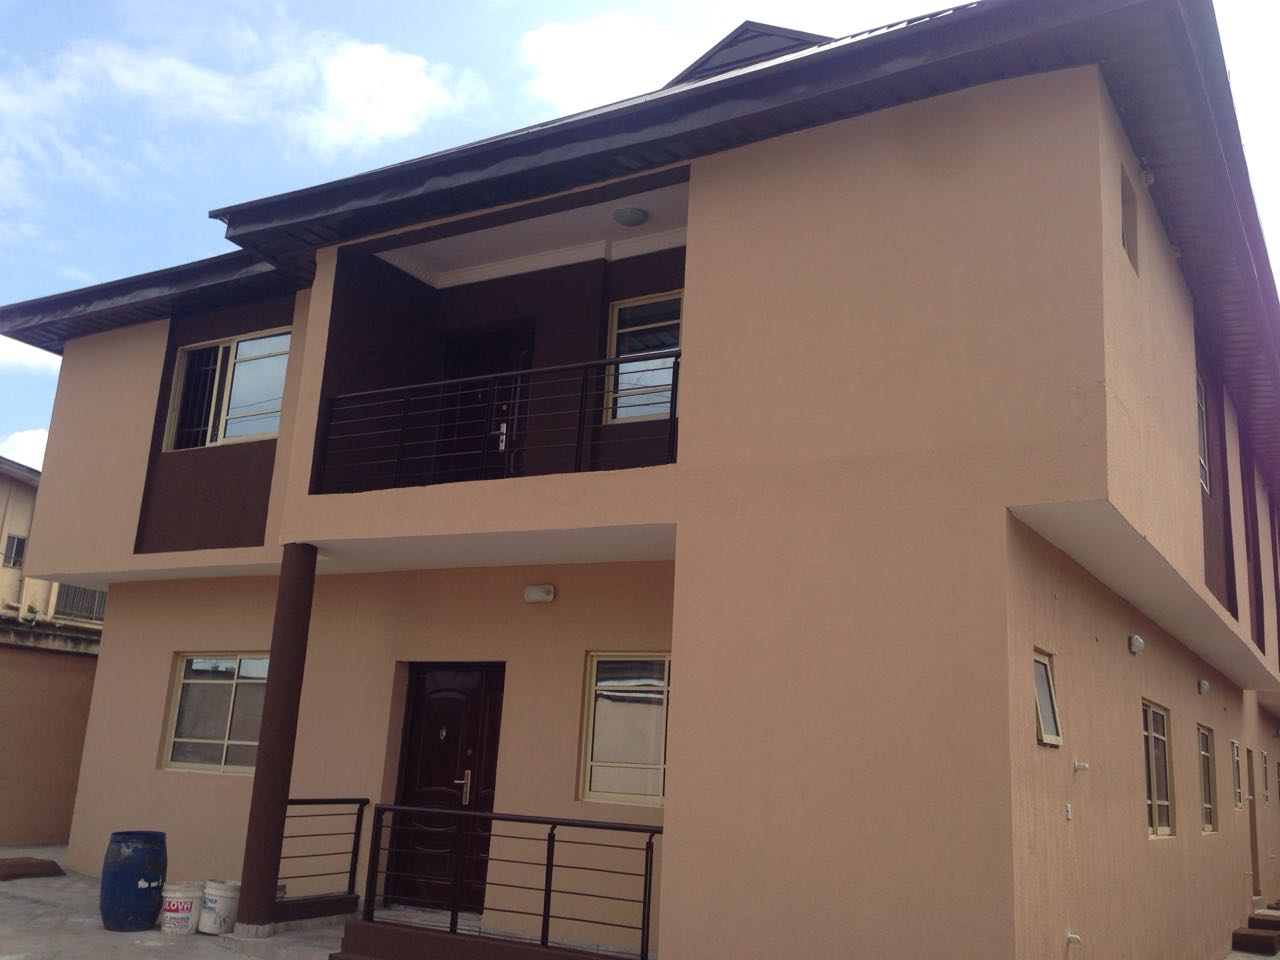 SALE: 4-Units, 3-Bedroom Flats With 2-Units, 2-Bedroom